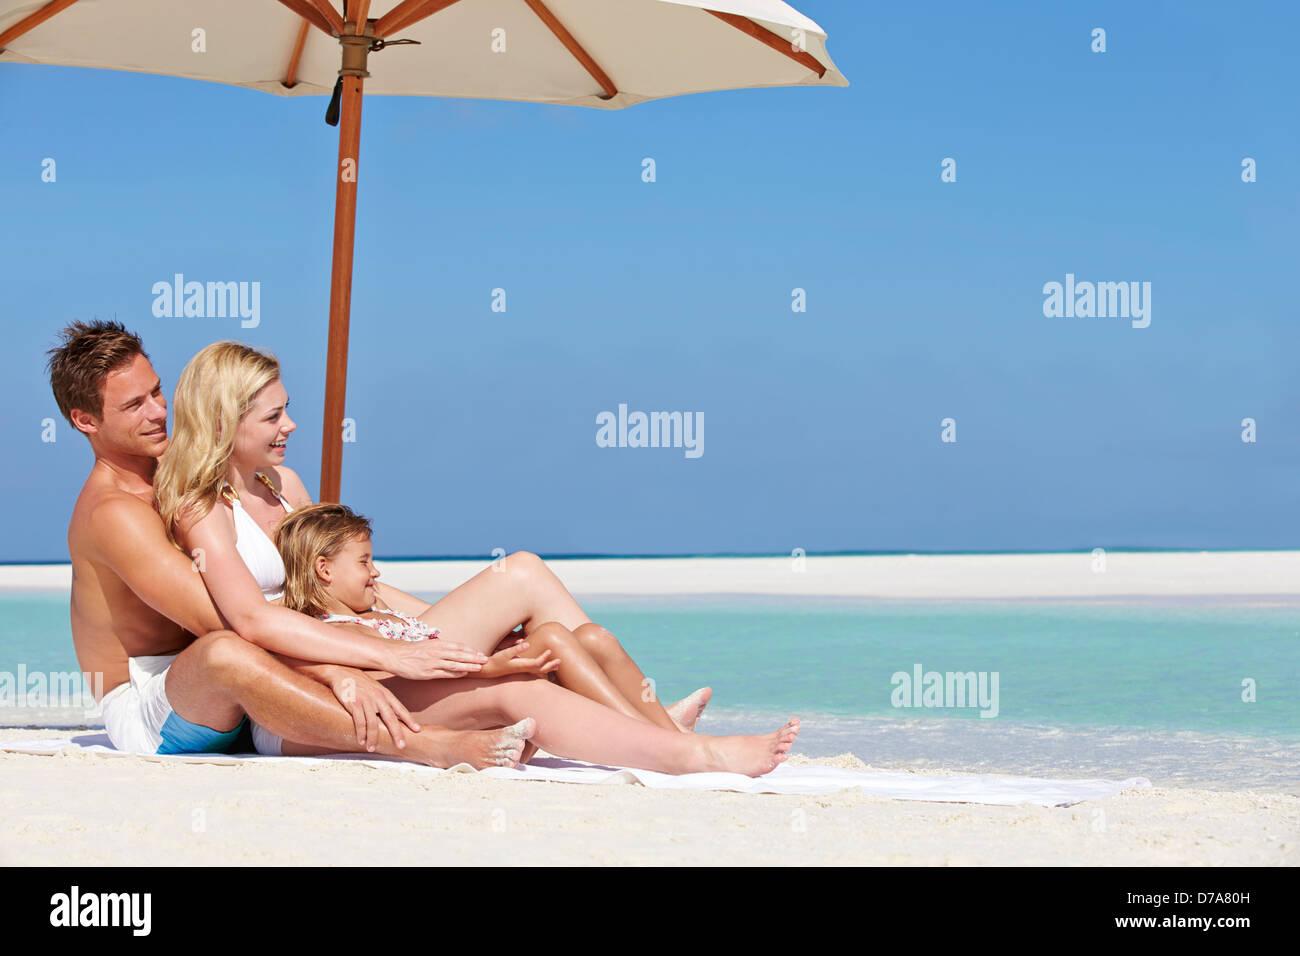 Family Sitting Under Umbrella On Beach Holiday - Stock Image